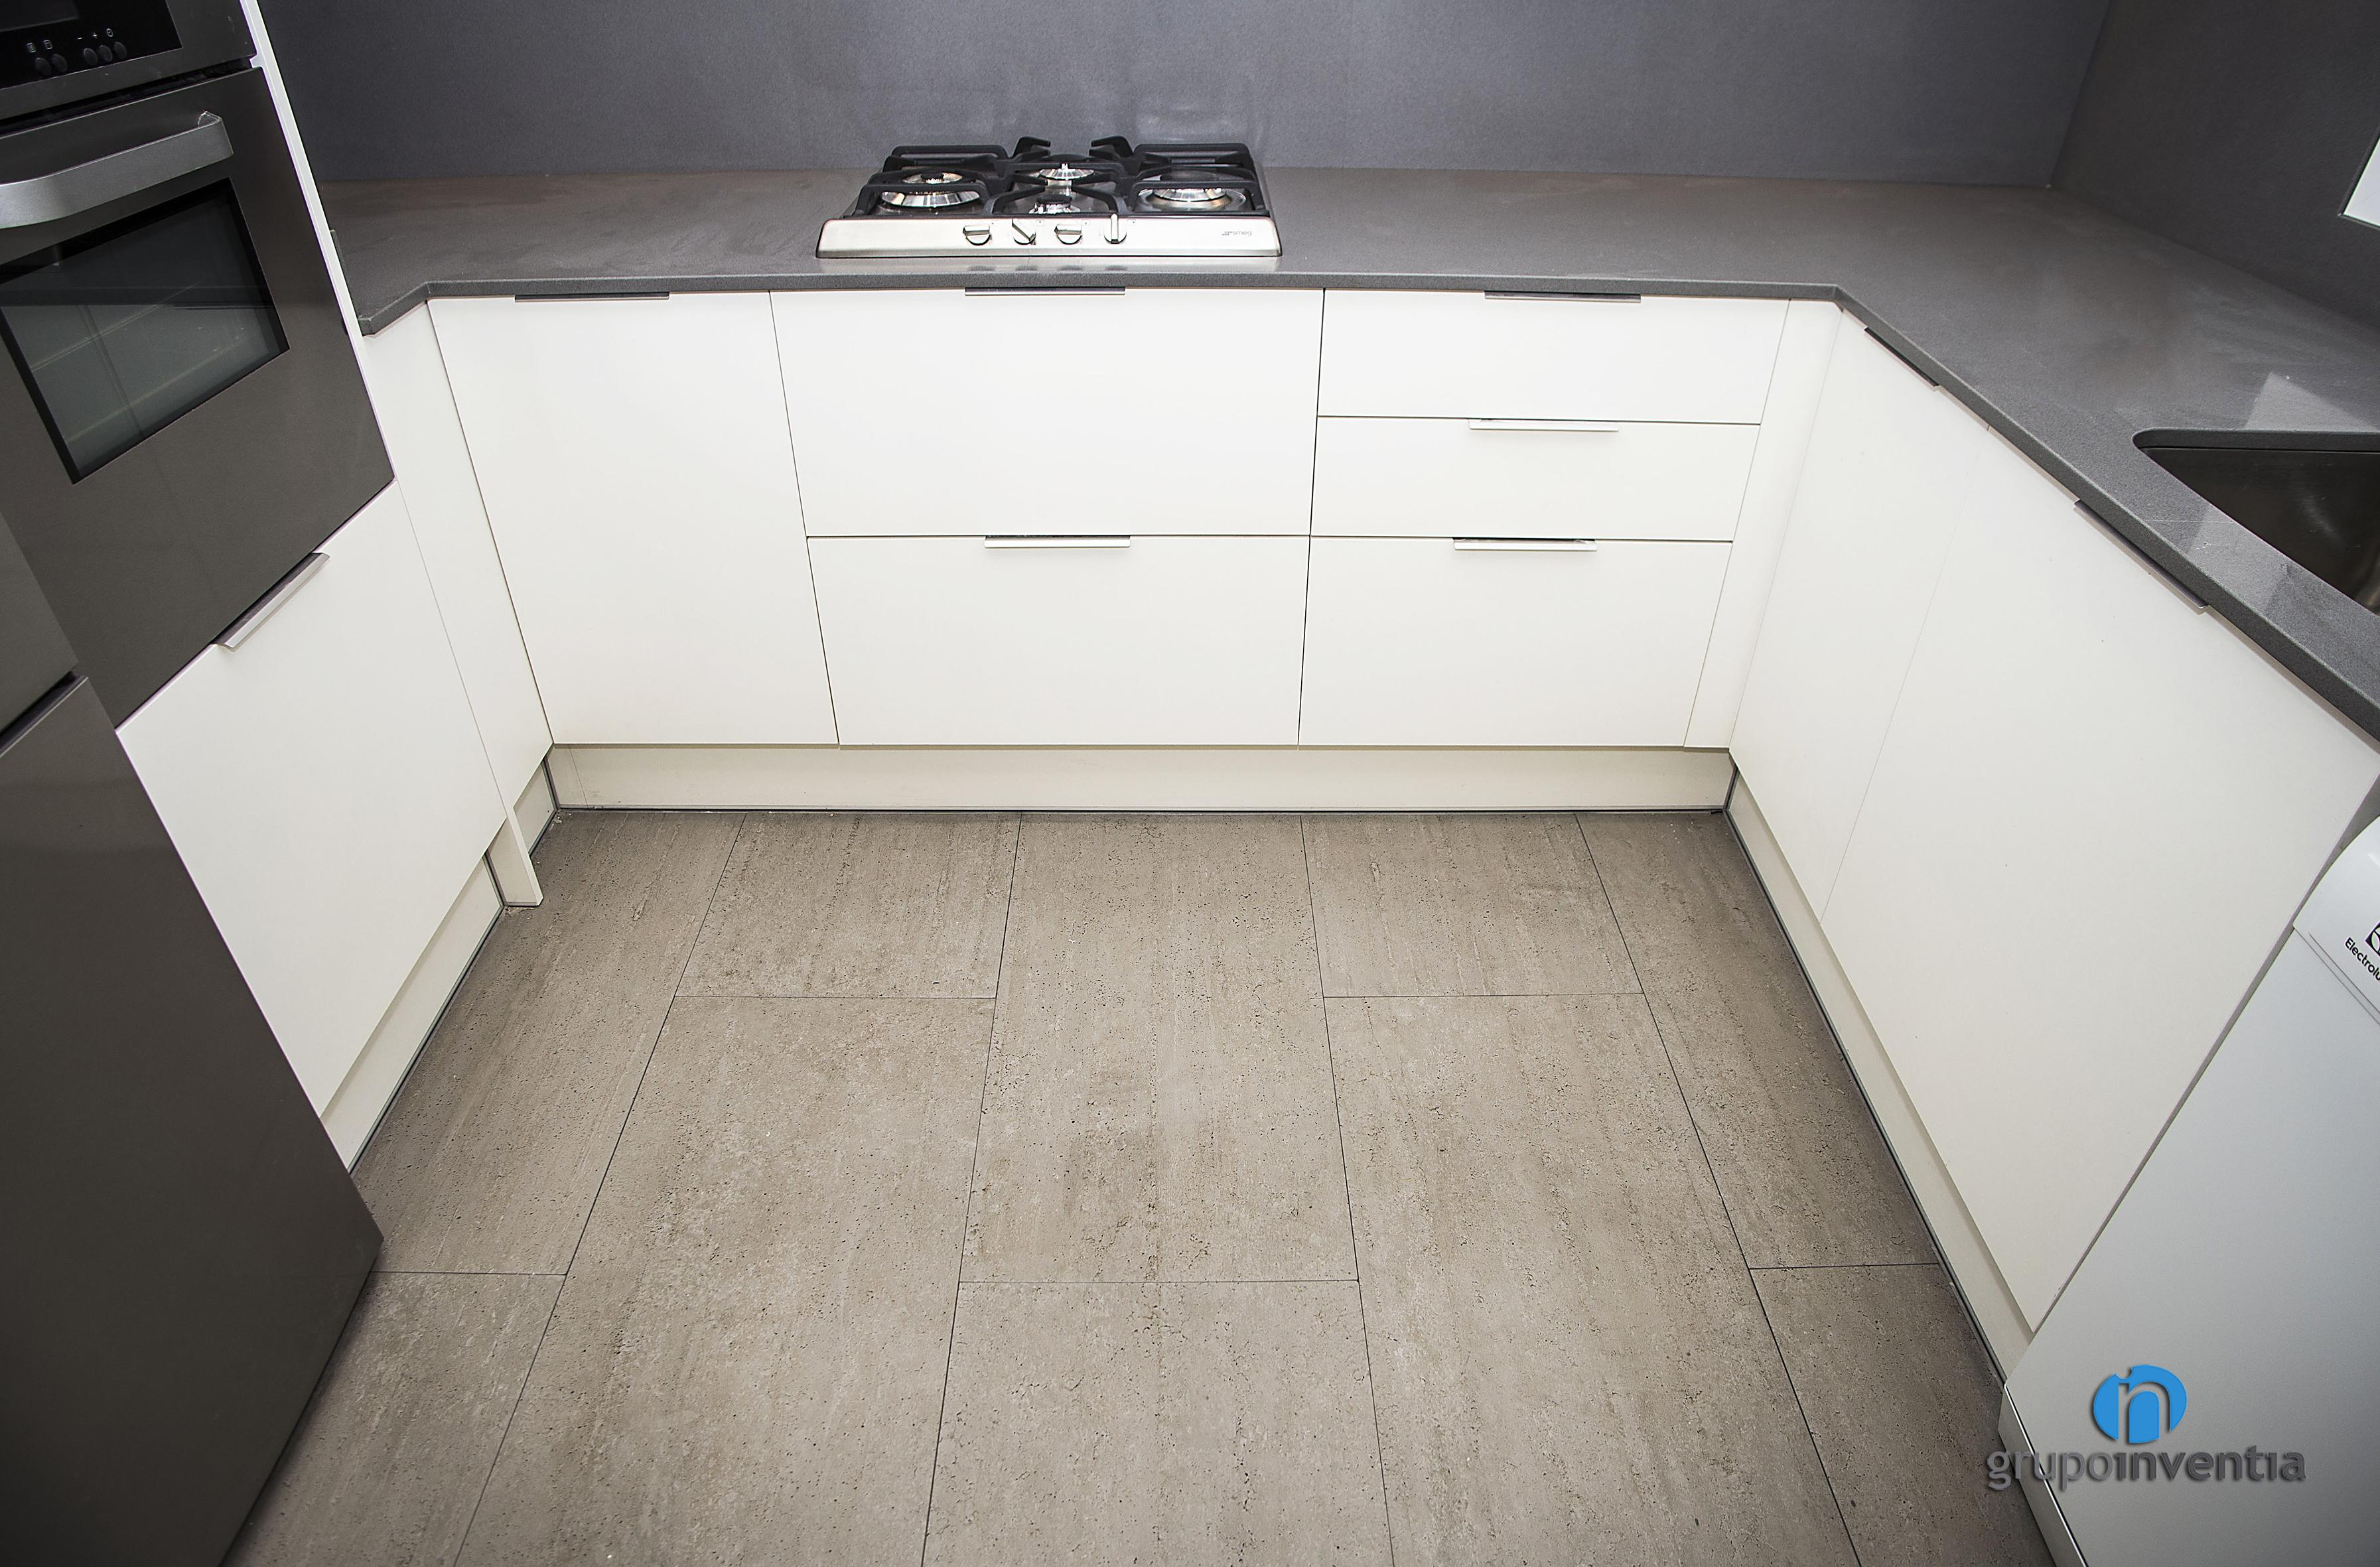 Pavimentos cocina empresa de distribucin de pavimentos y for Cocinas con parquet